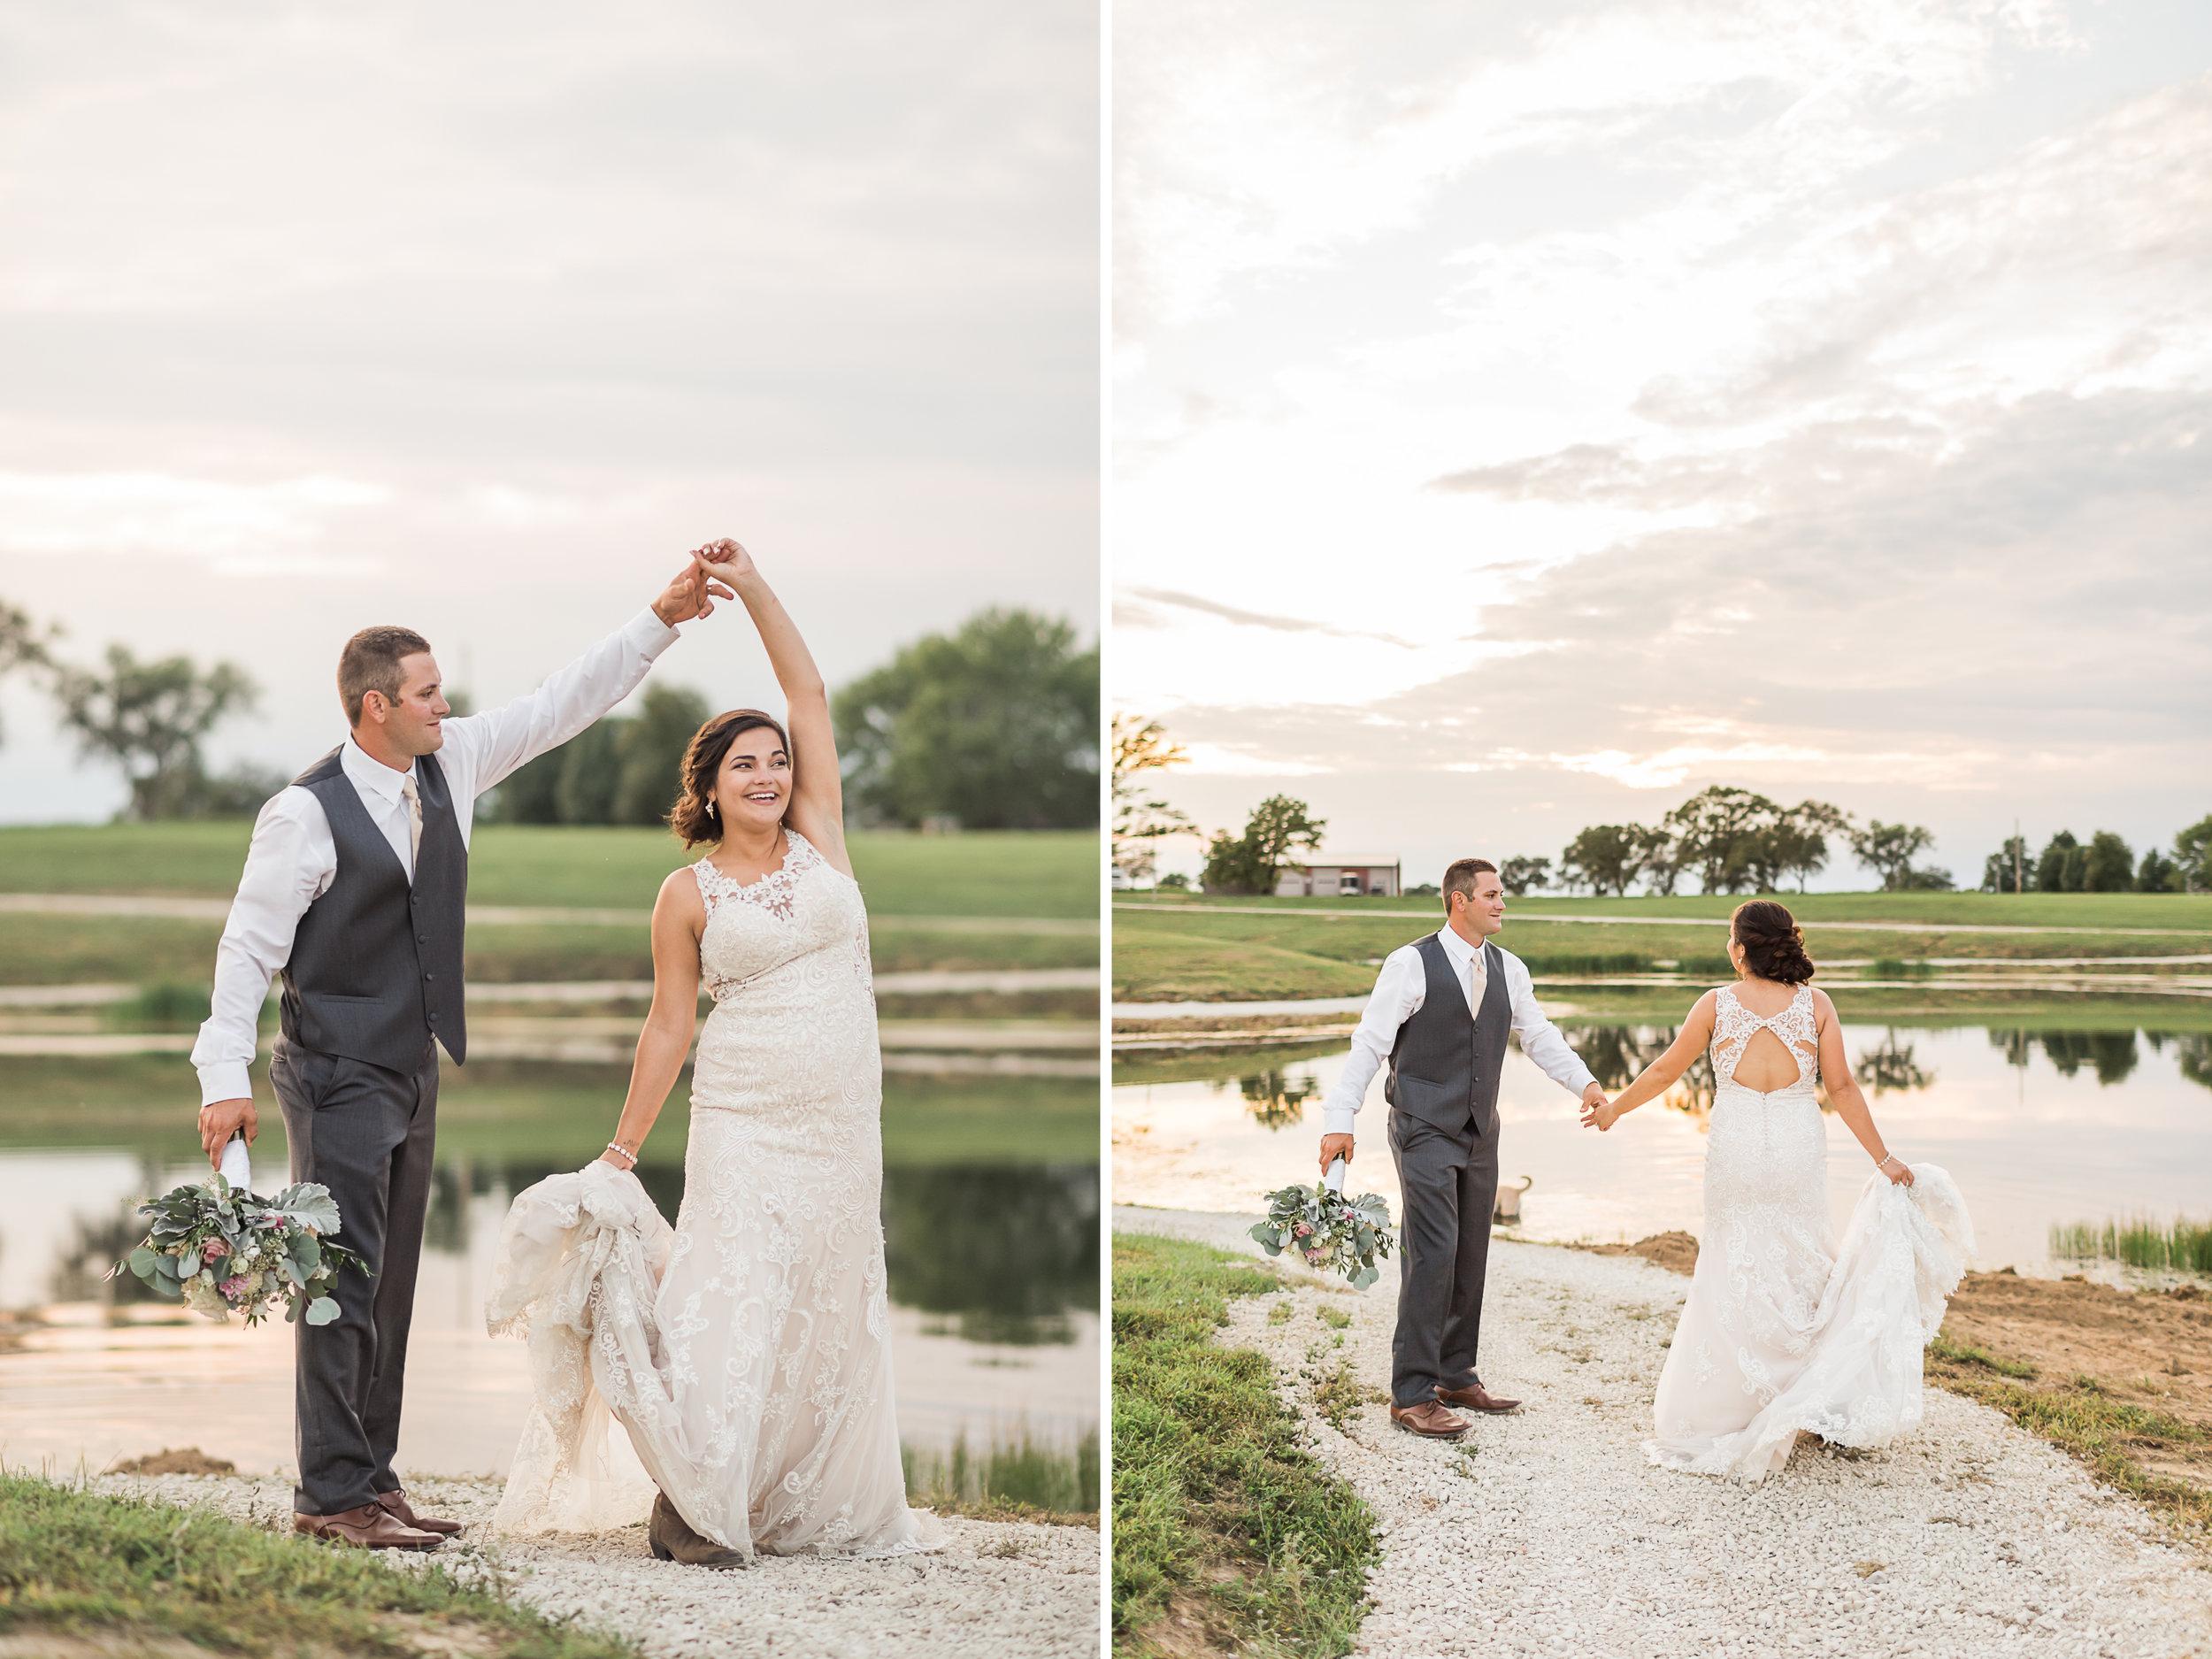 romanticcountrywedding-21.jpg